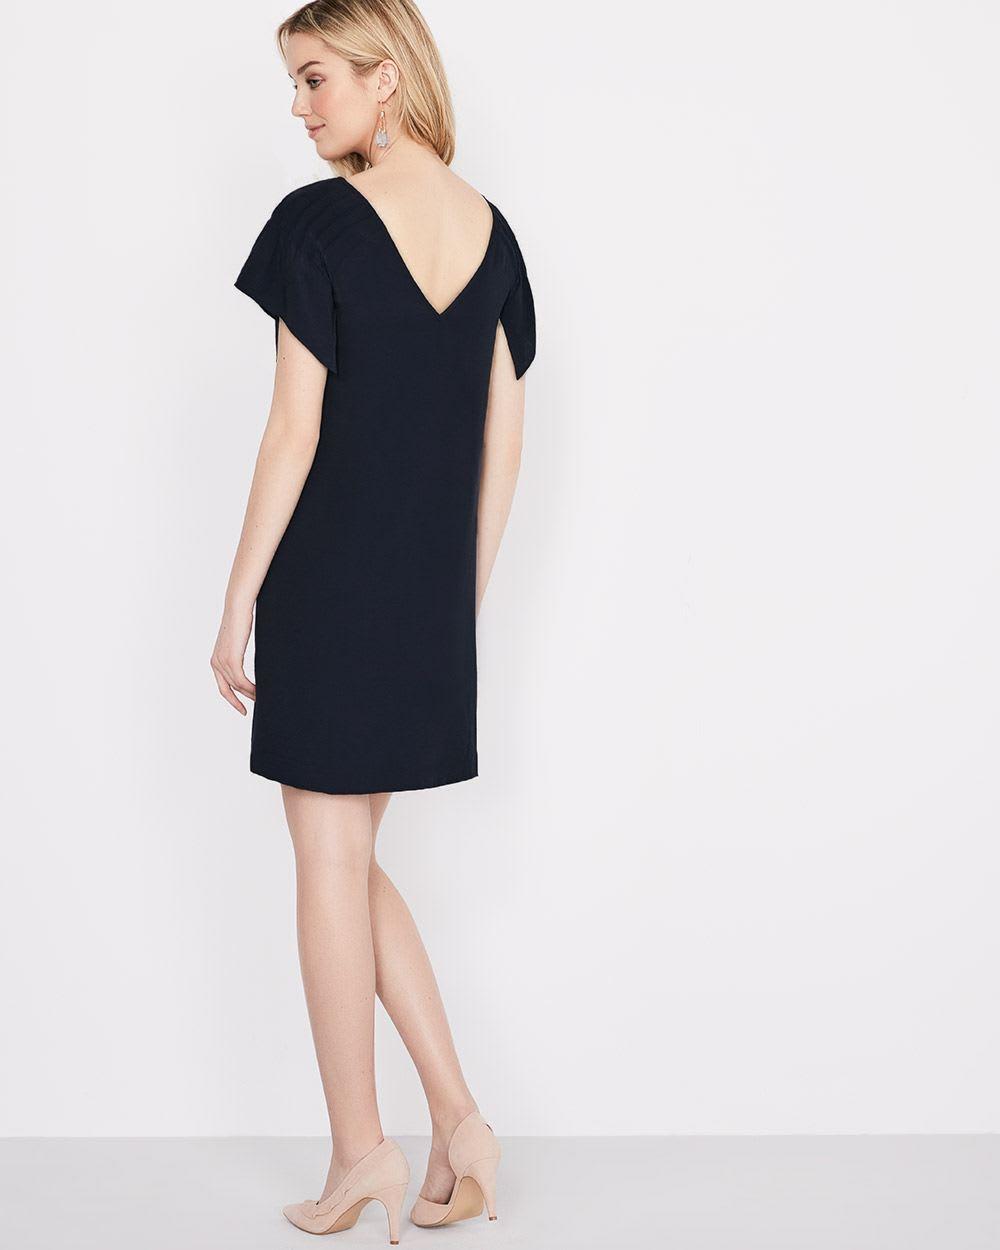 Shift dress with flowy sleeve | RW&CO.